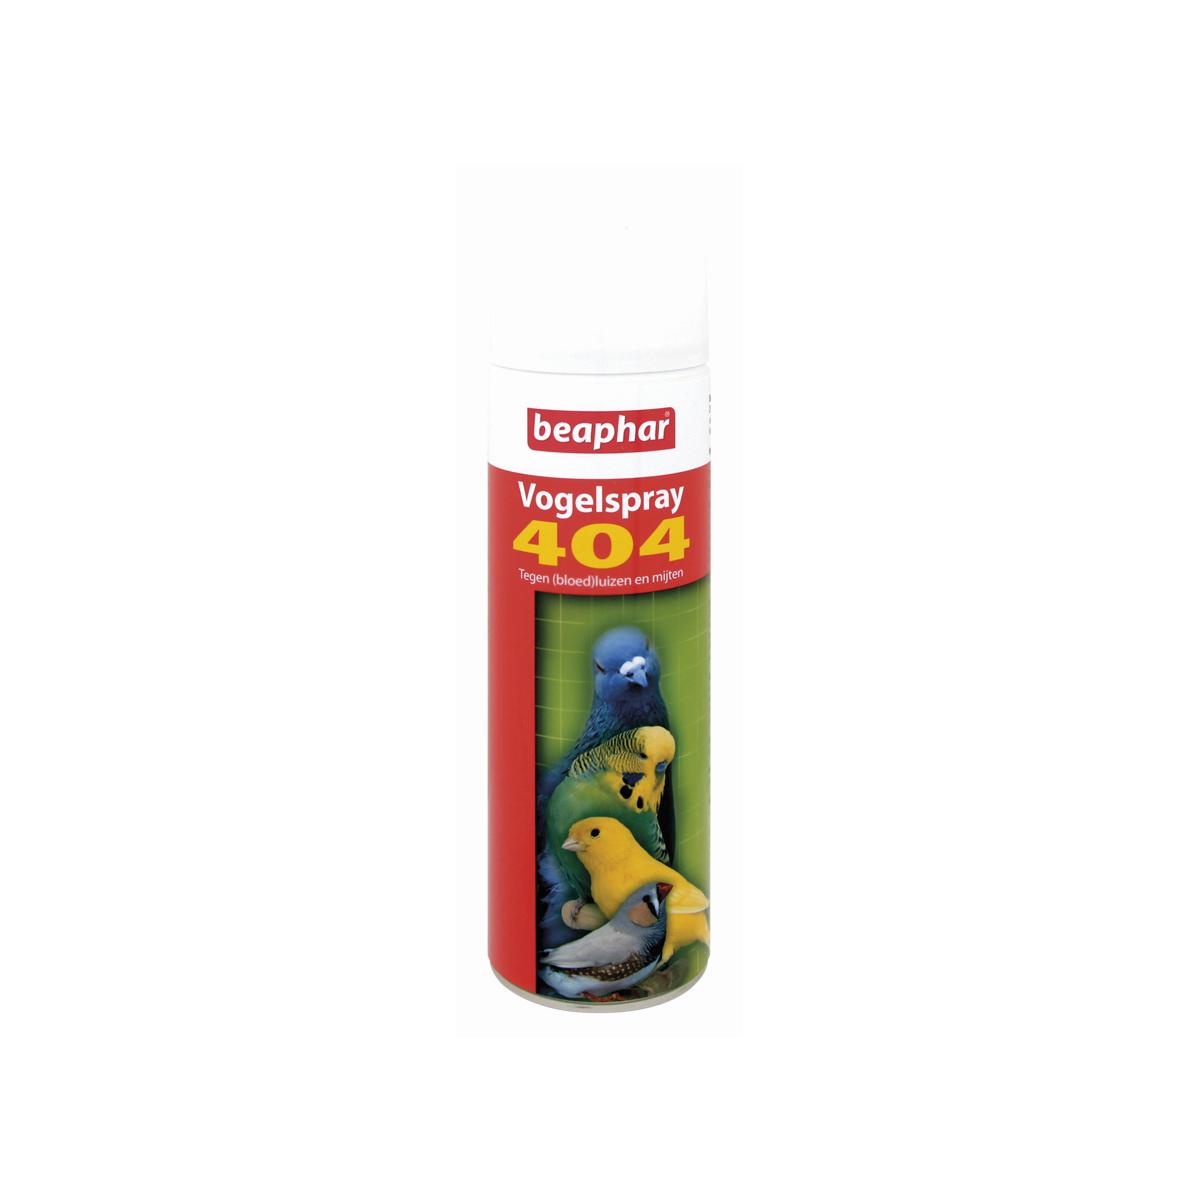 BEA 404 VOGELSPRAY 250ML 00001